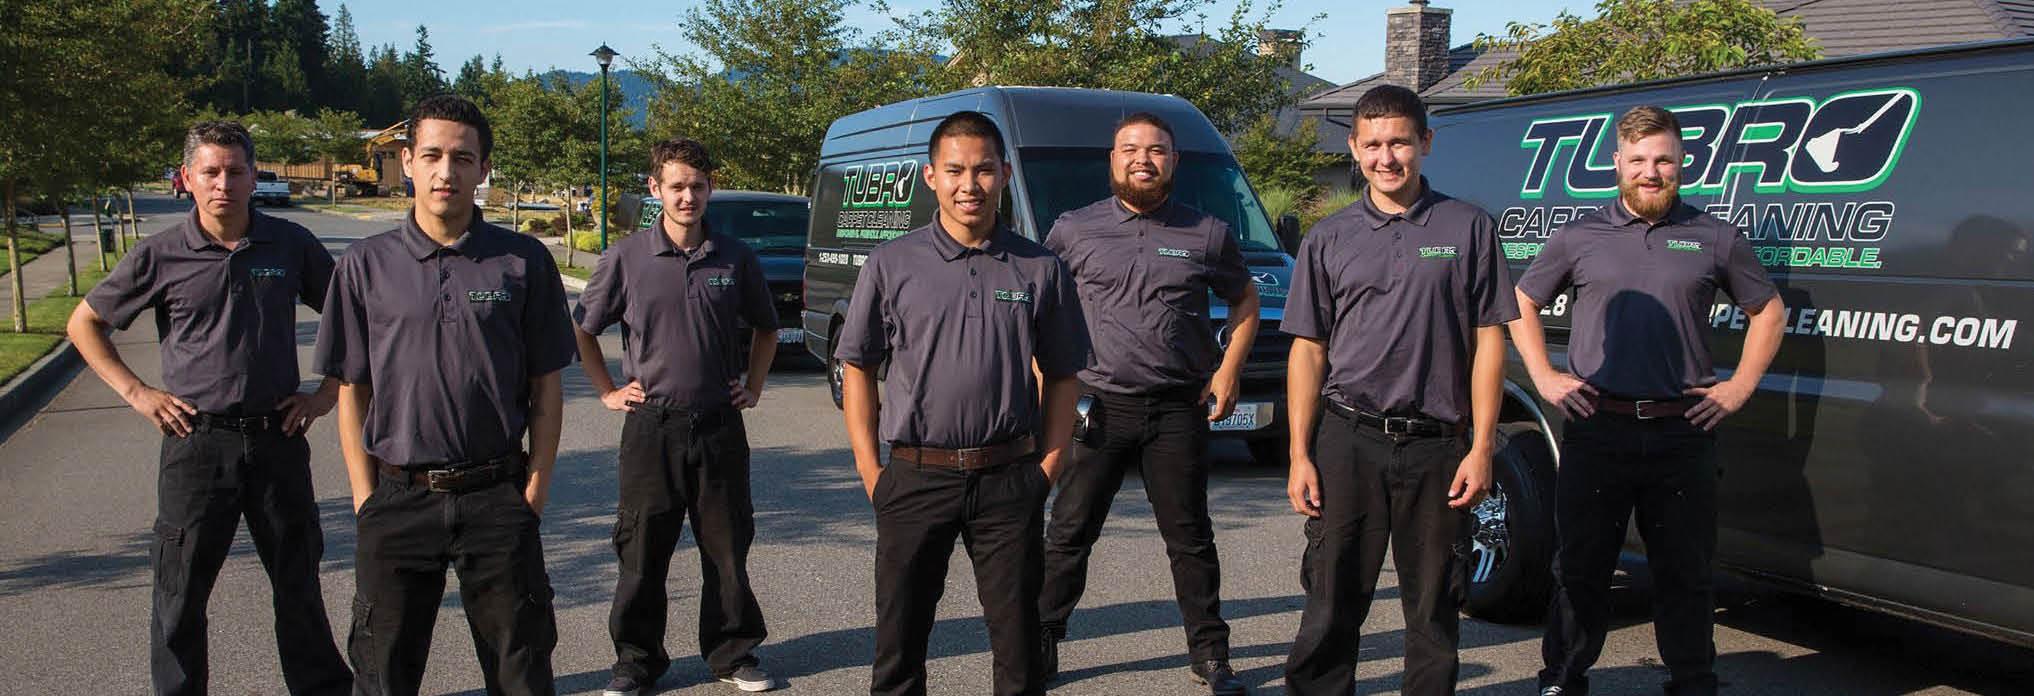 Tubro Carpet Cleaning main banner image - friendly employees - Auburn, WA